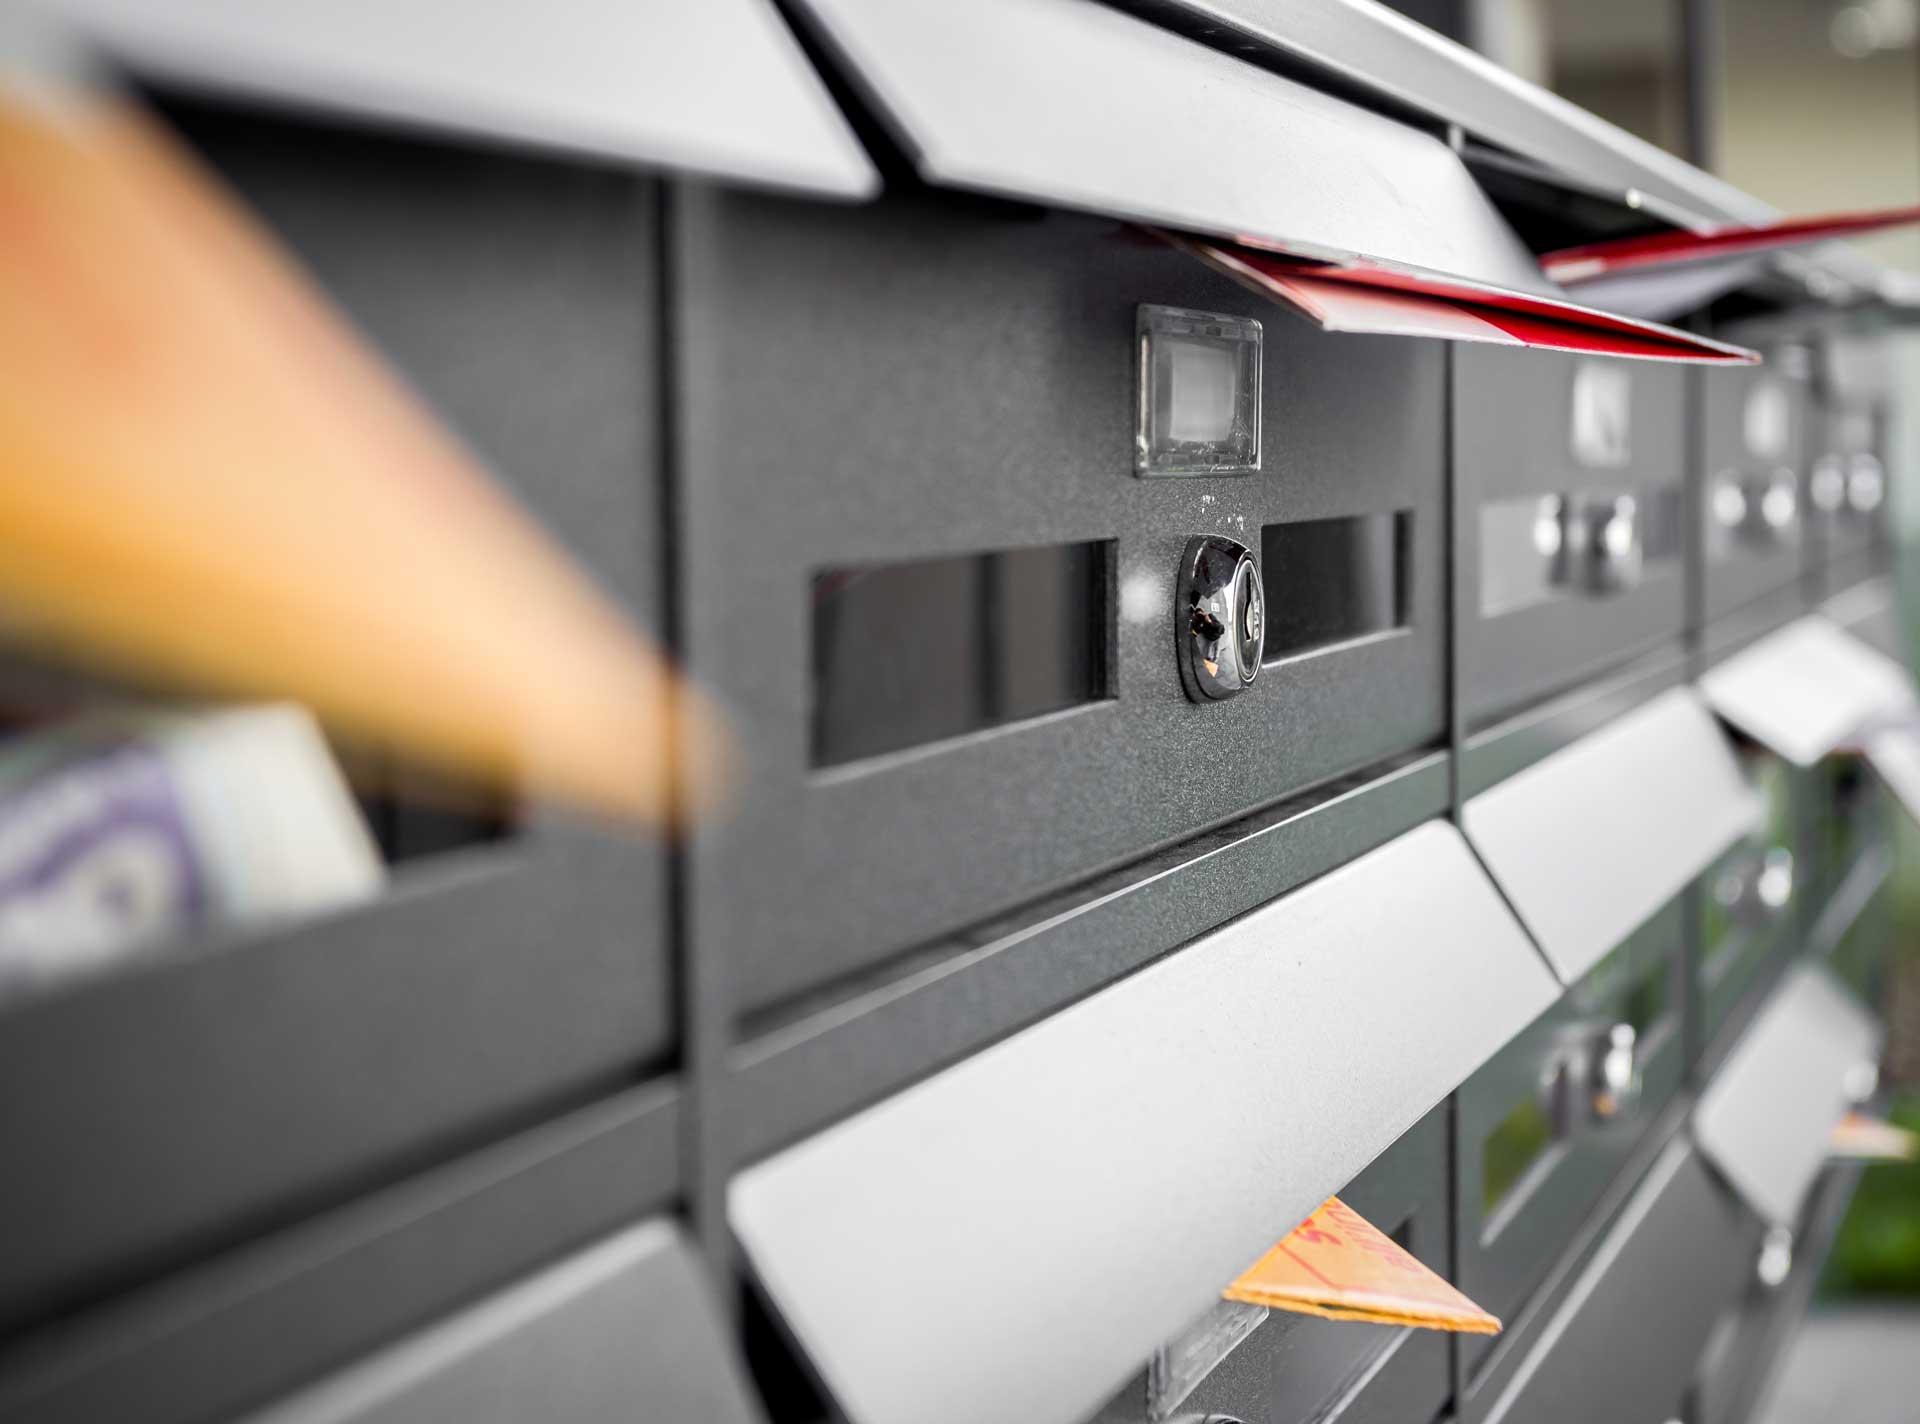 mailboxes-filled-PGMVRKP.jpg